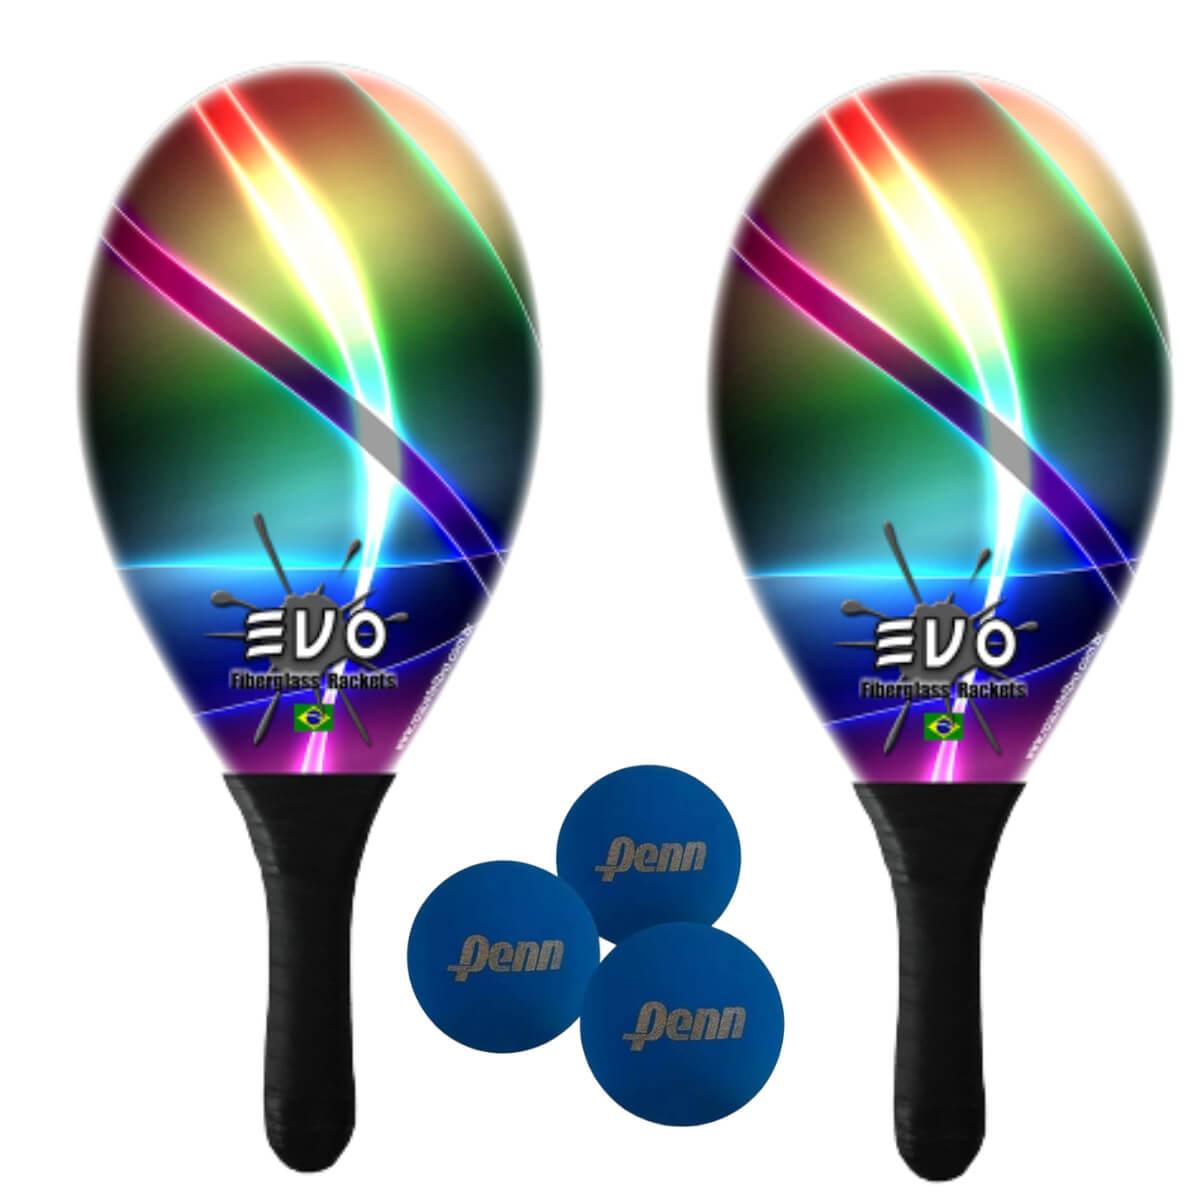 Kit Raquetes Frescobol Evo Fibra Vidro Laser com 3 Bolas Penn